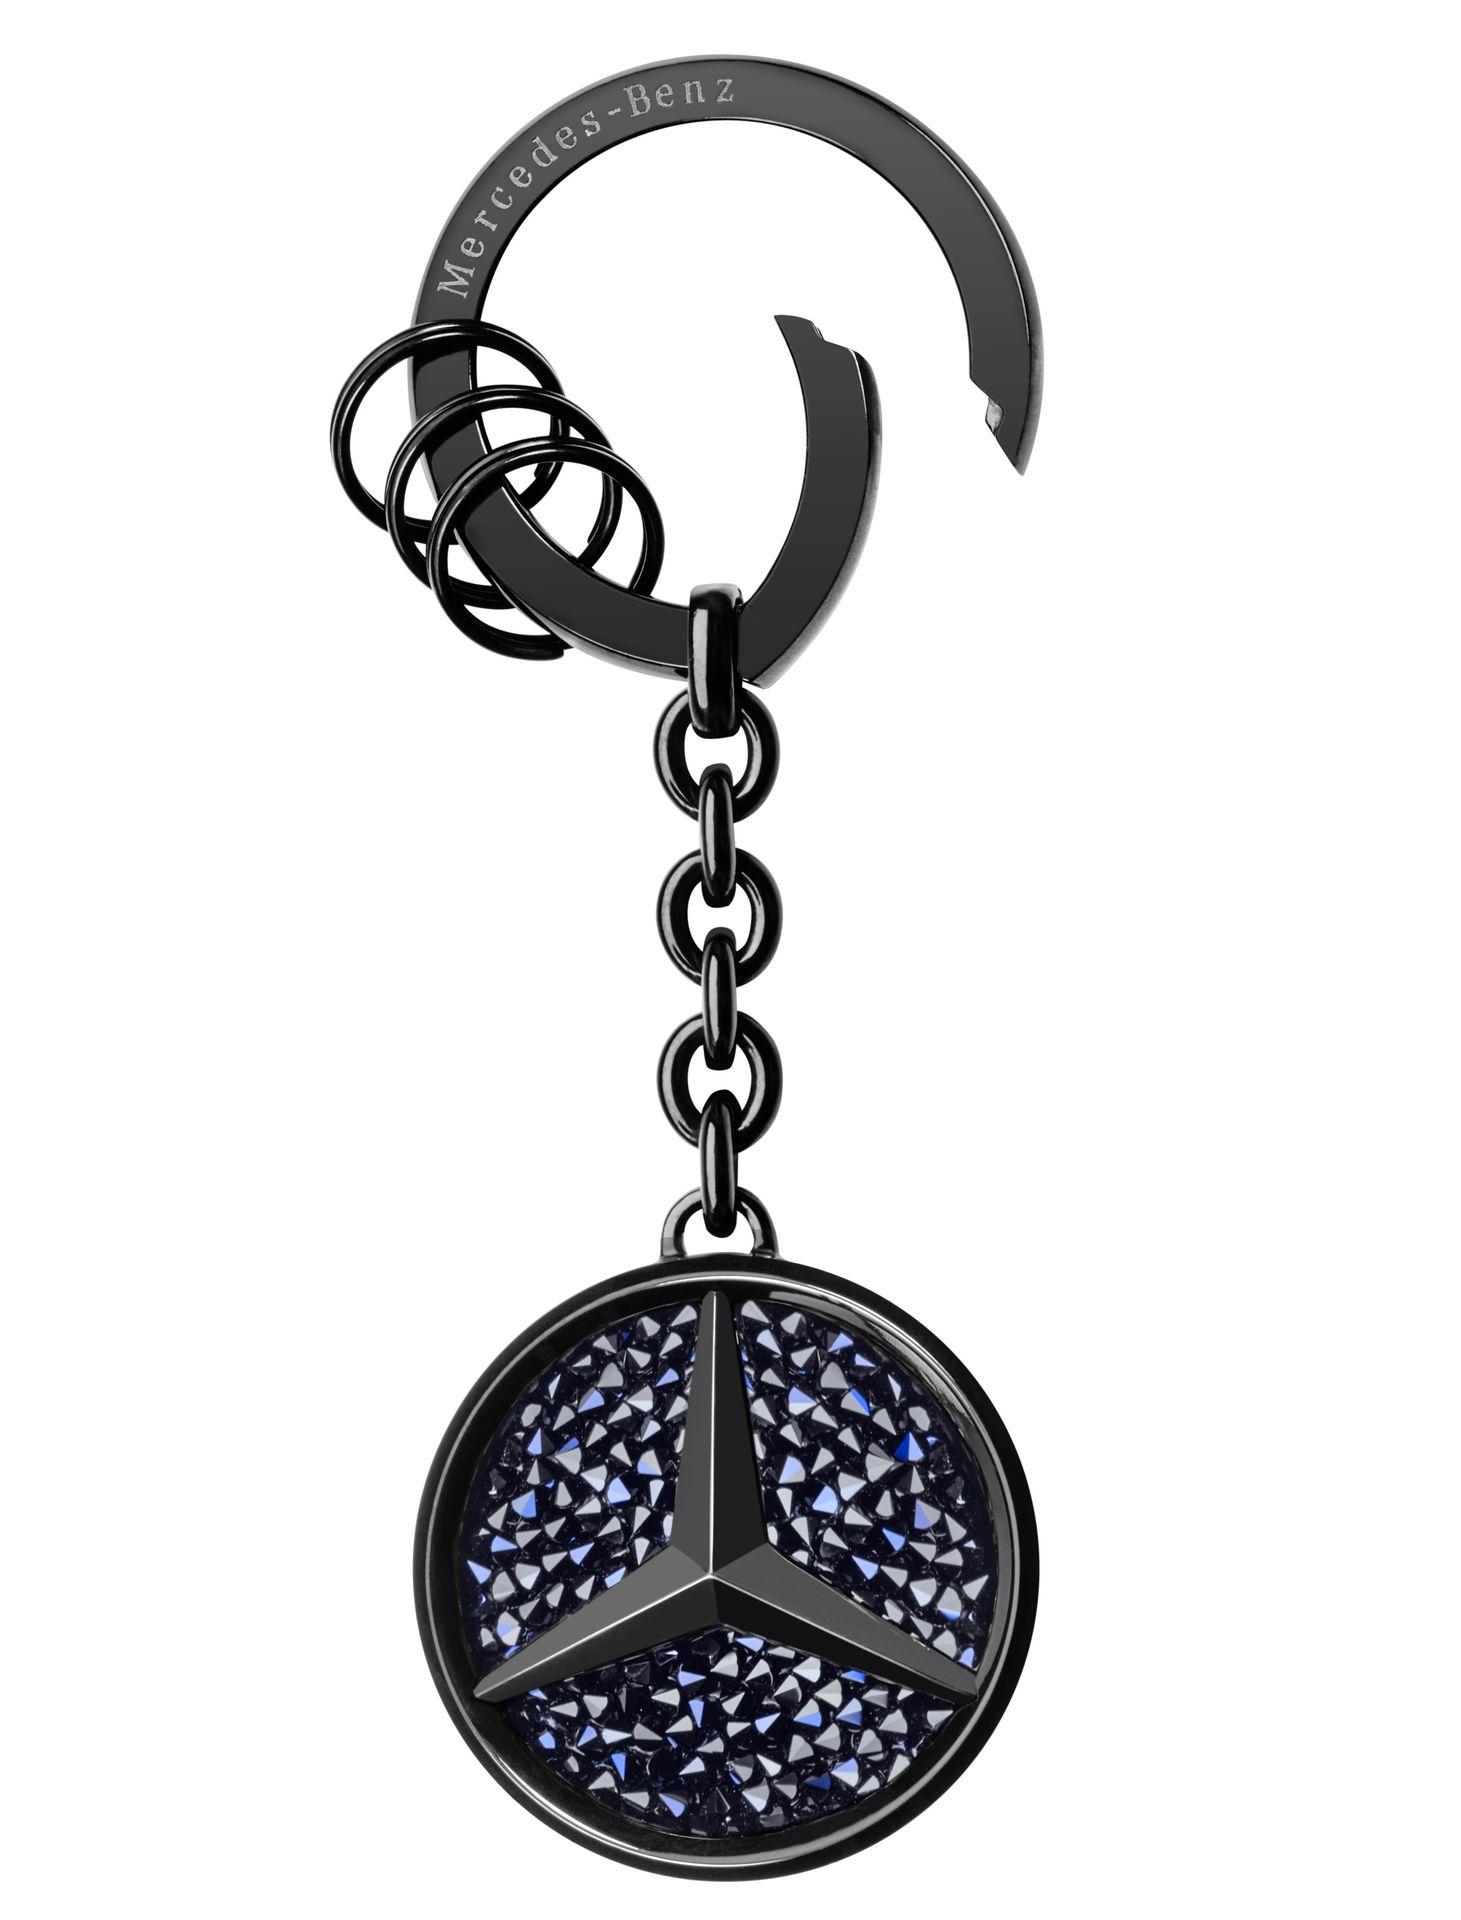 Брелок для ключей Mercedes-Benz Key Ring, Saint-Tropez, Black Edition 2017